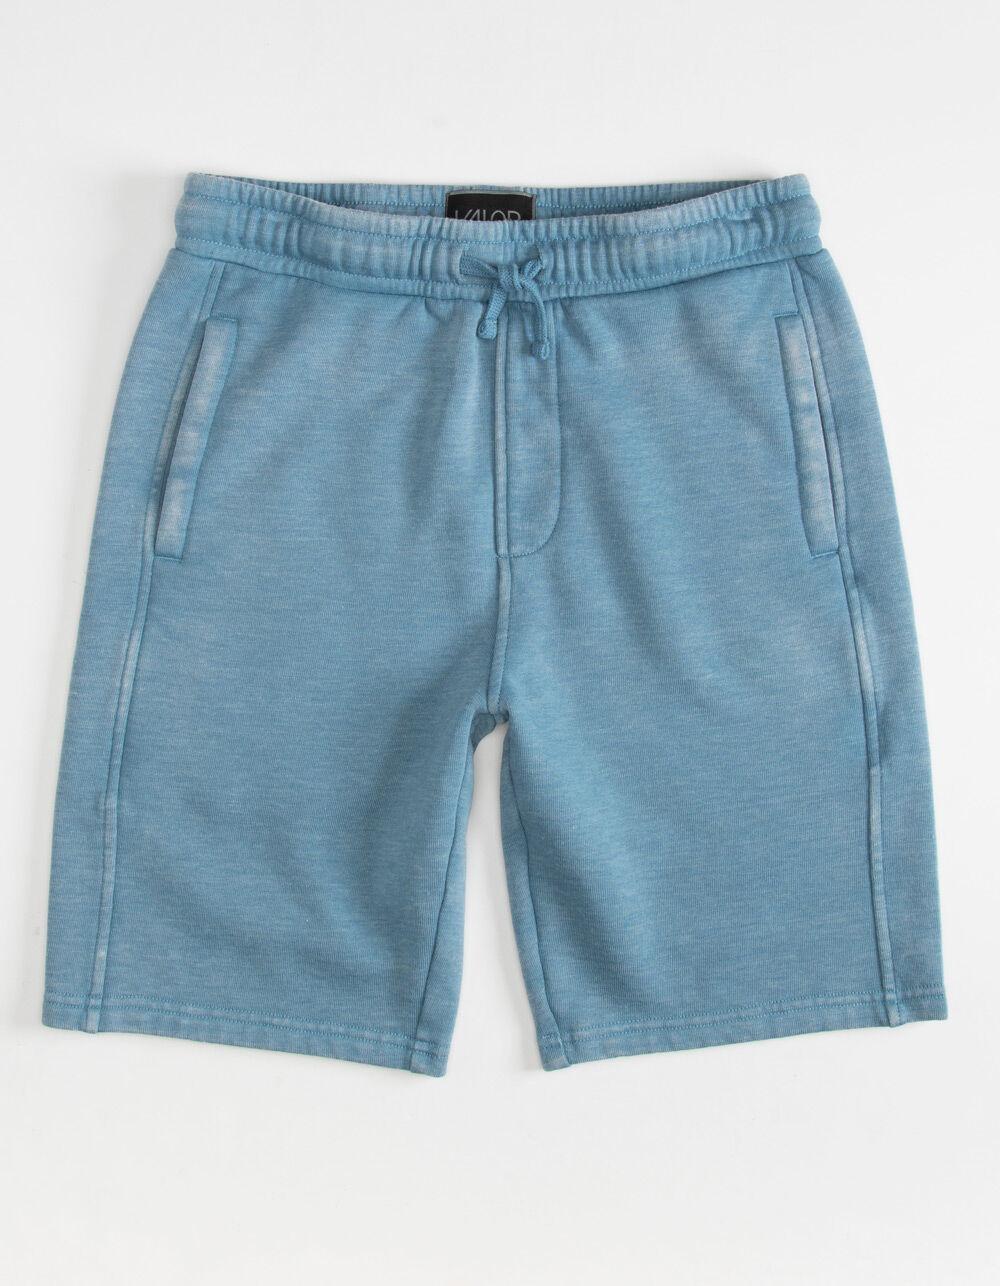 VALOR Phoenix Boys Blue Sweat Shorts